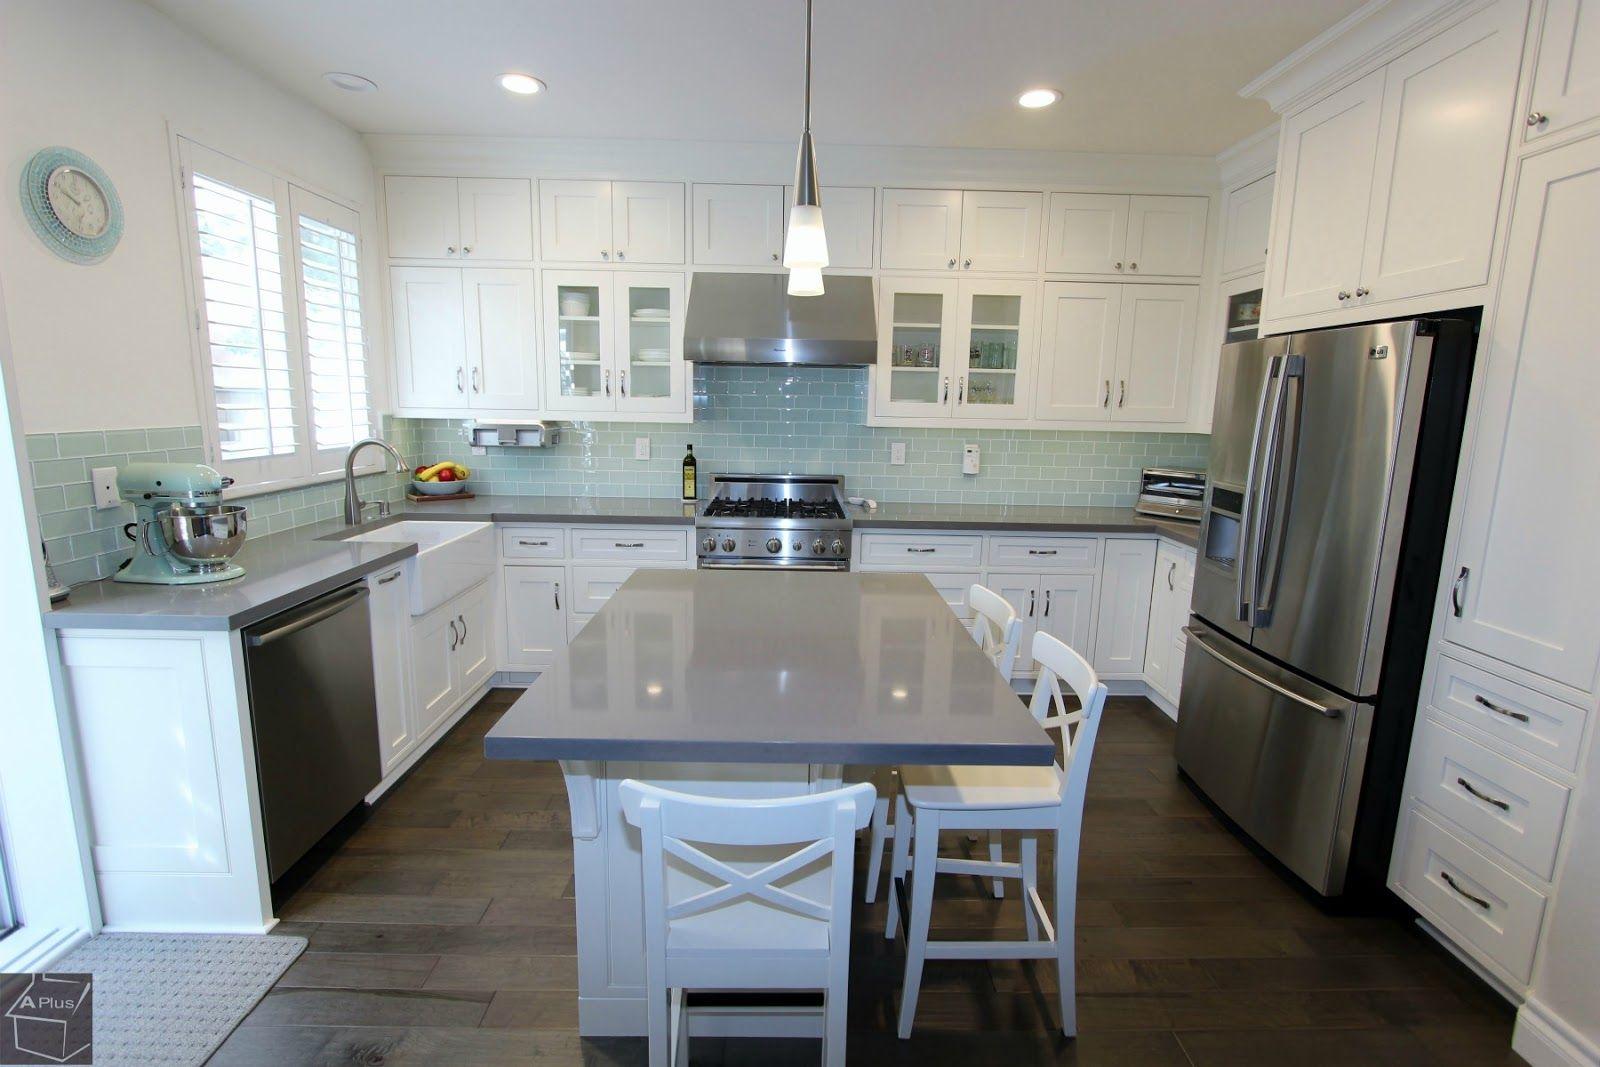 Irvine Complete Kitchen Remodel With Brand New Custom Cabinets Kitchen Remodel Kitchen Design Contemporary Kitchen